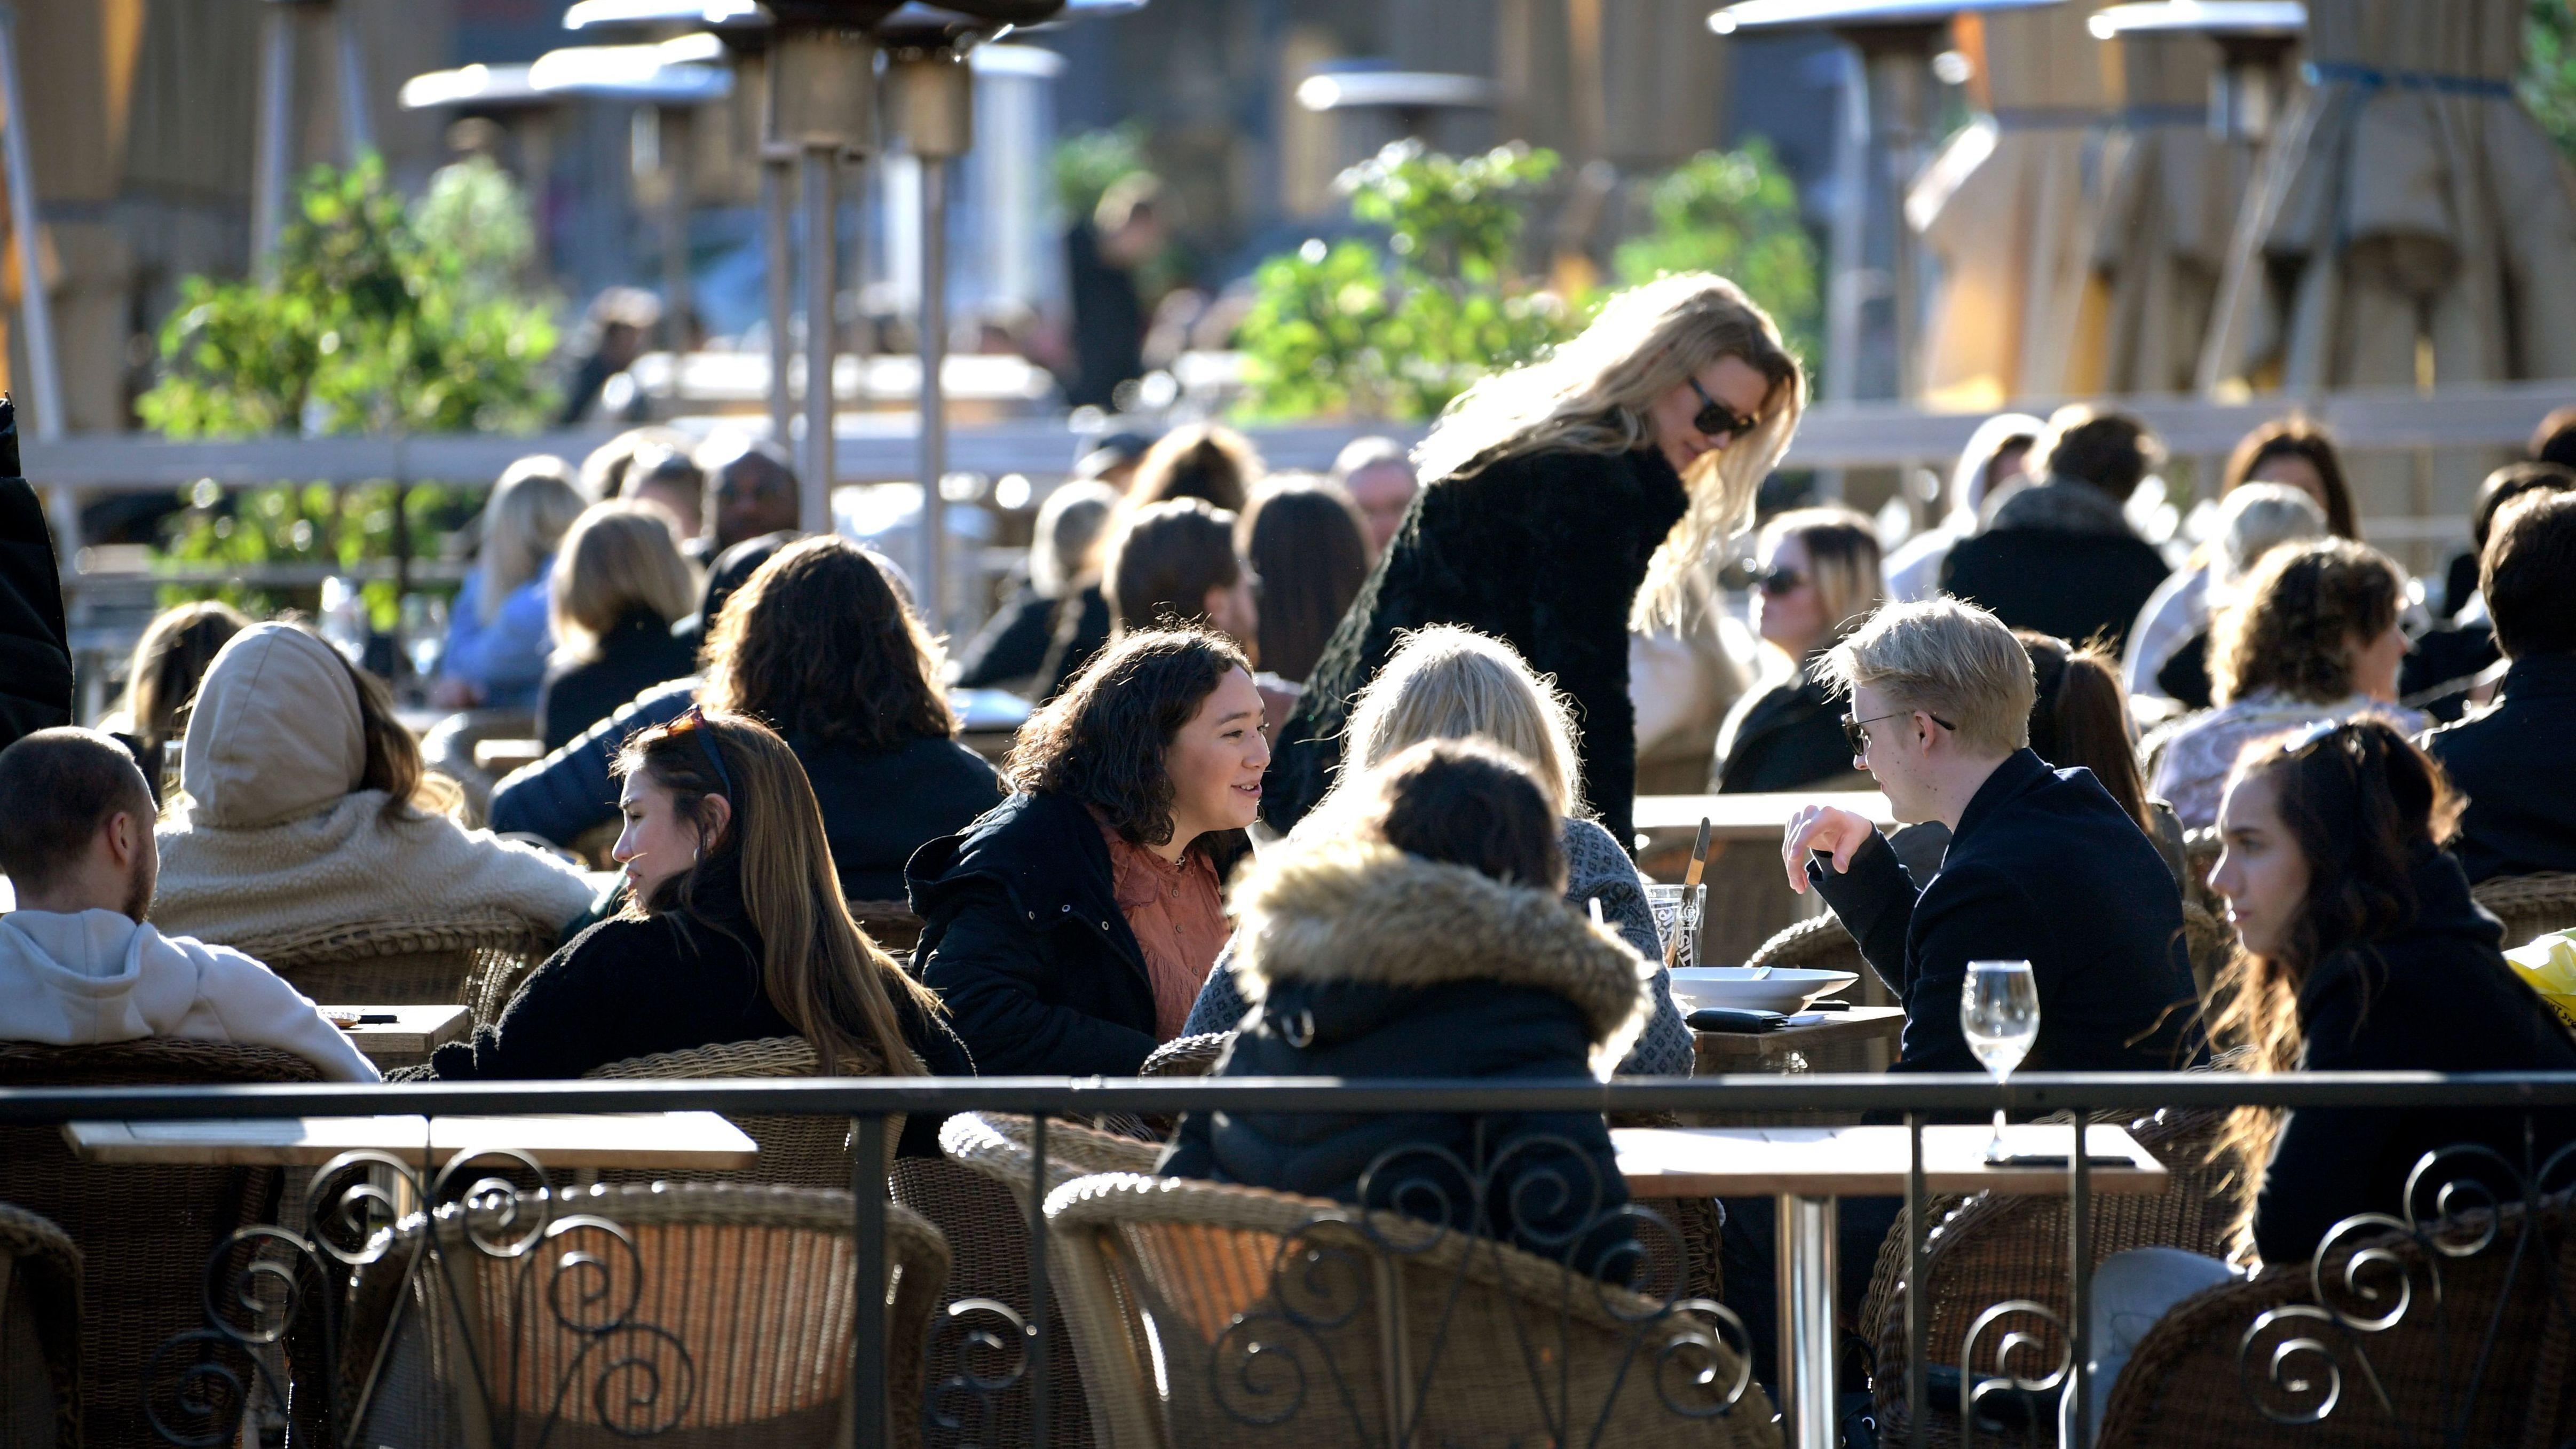 Sweden Bans Groups Larger Than 50 In Its First Major Coronavirus Crackdown Coronavirus Live Updates Npr